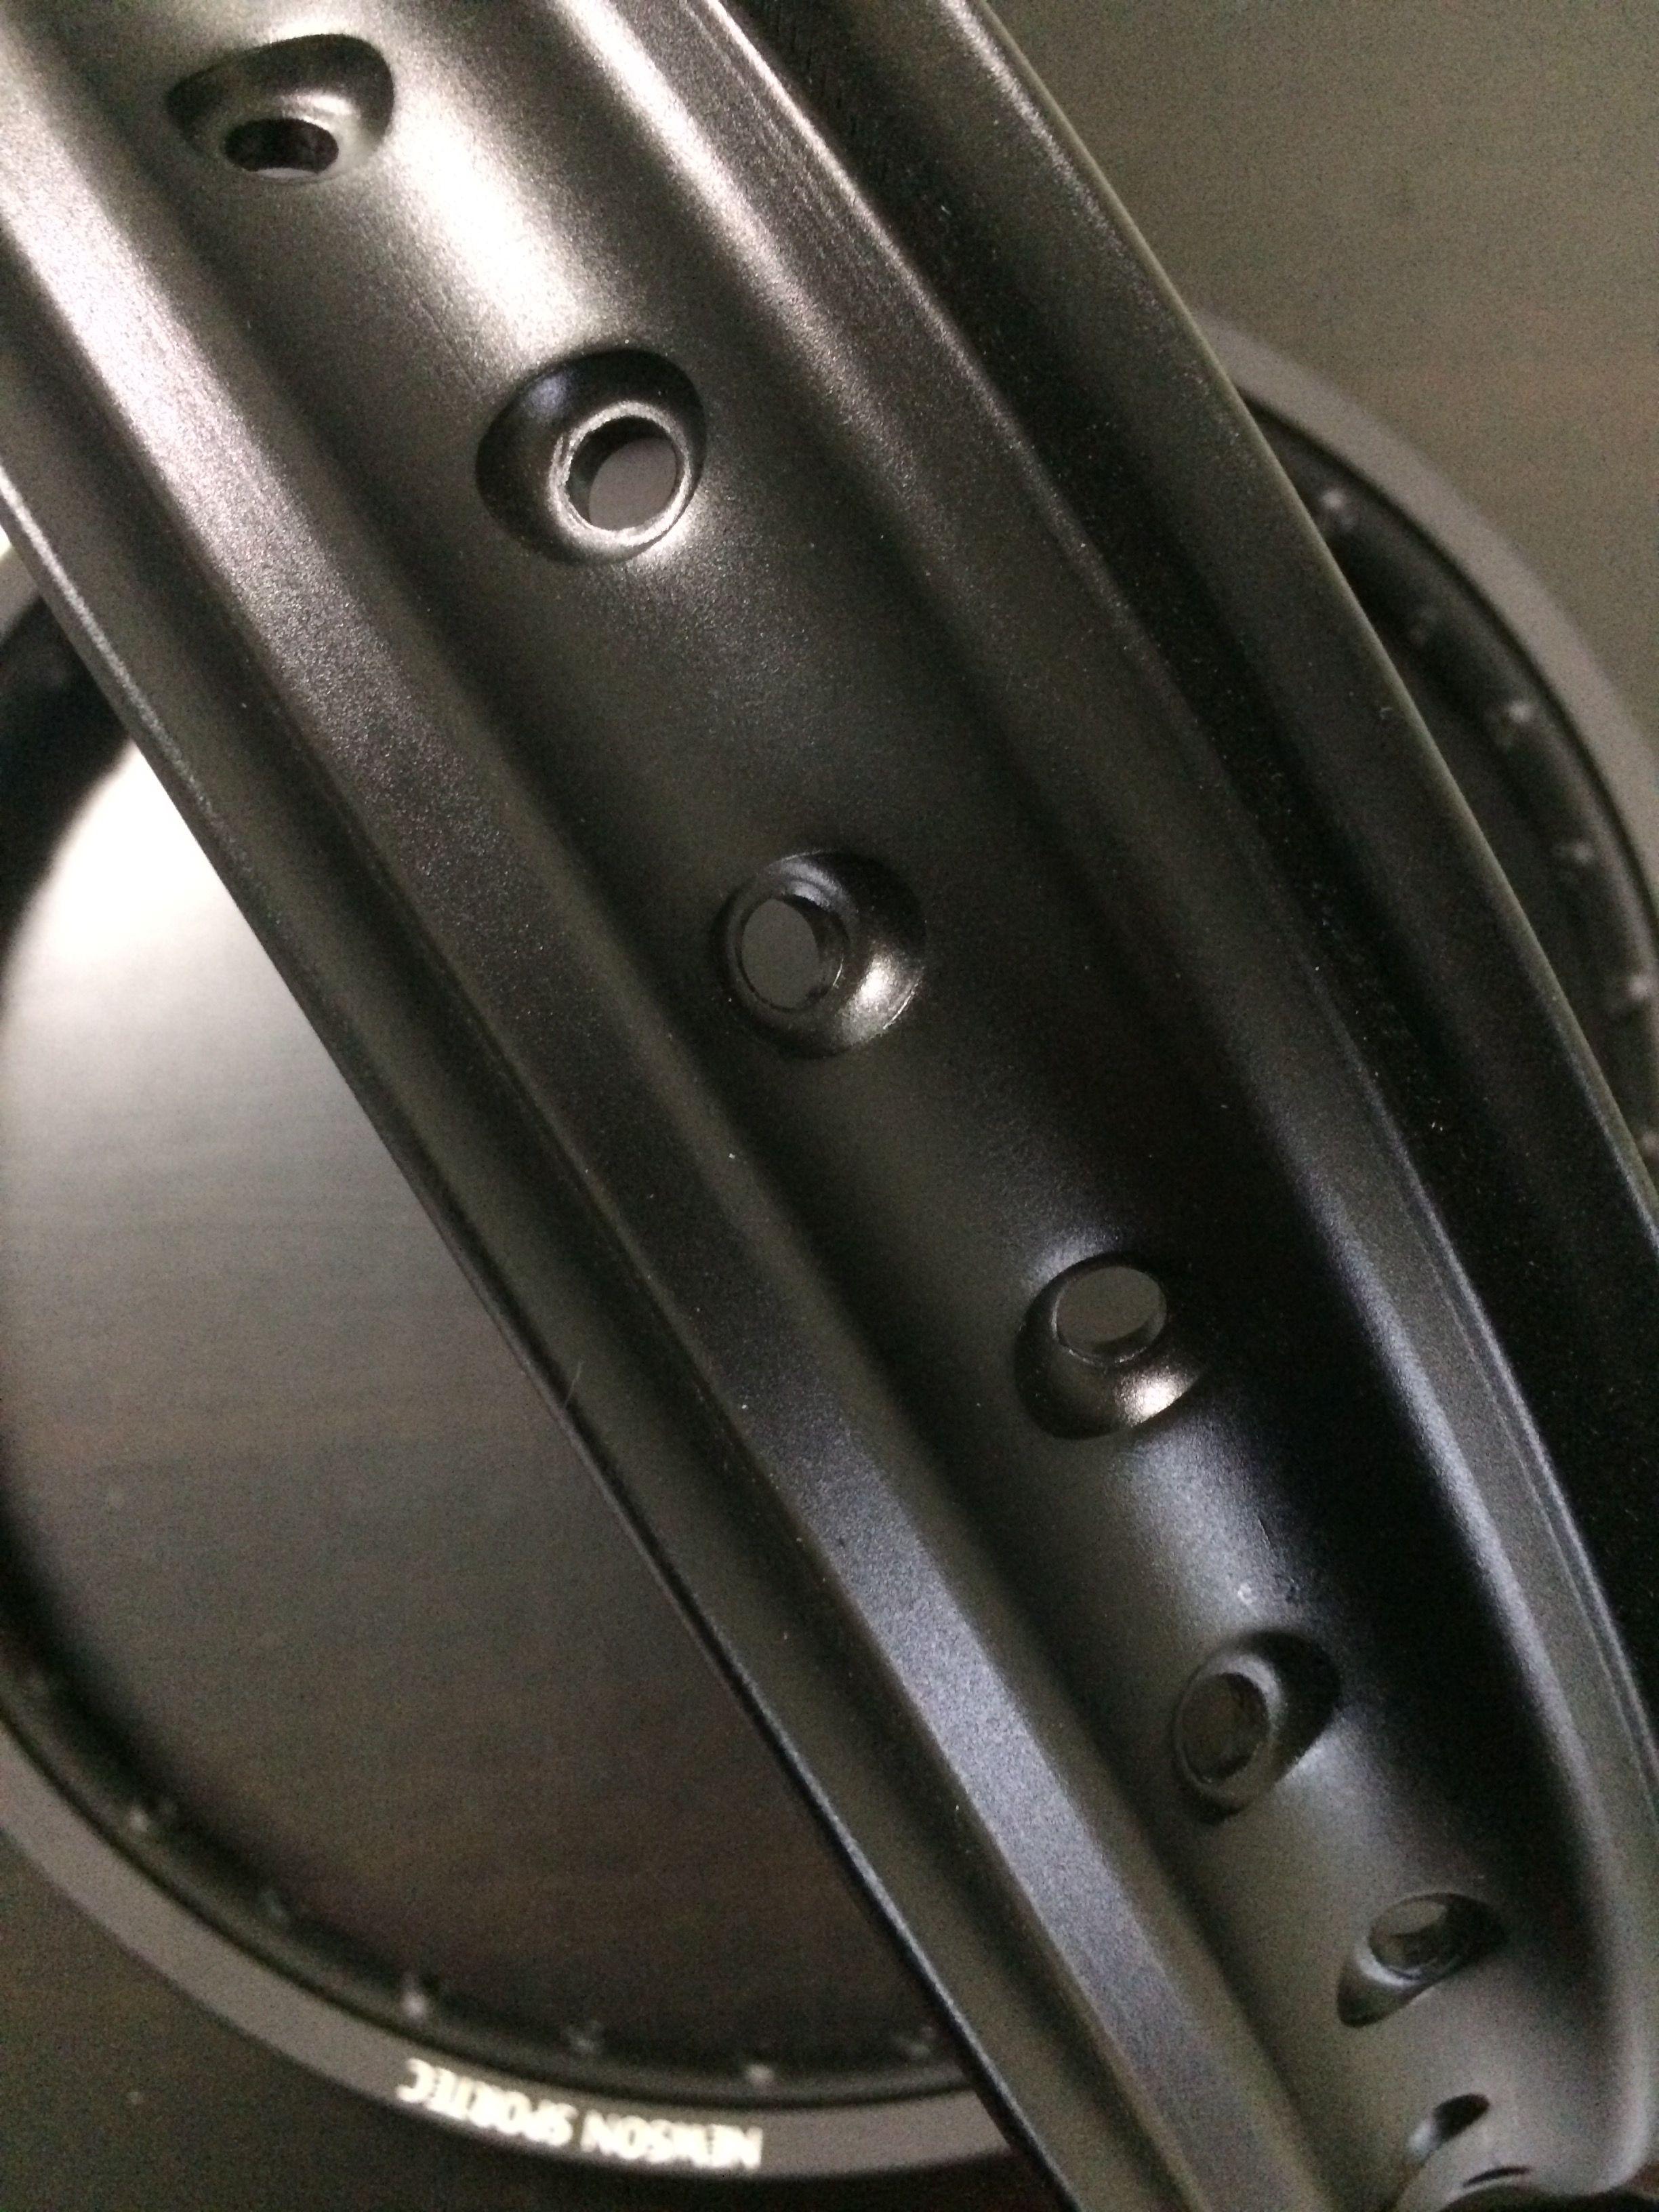 Pin On Motor Wheels W Newson Sportec Spokes